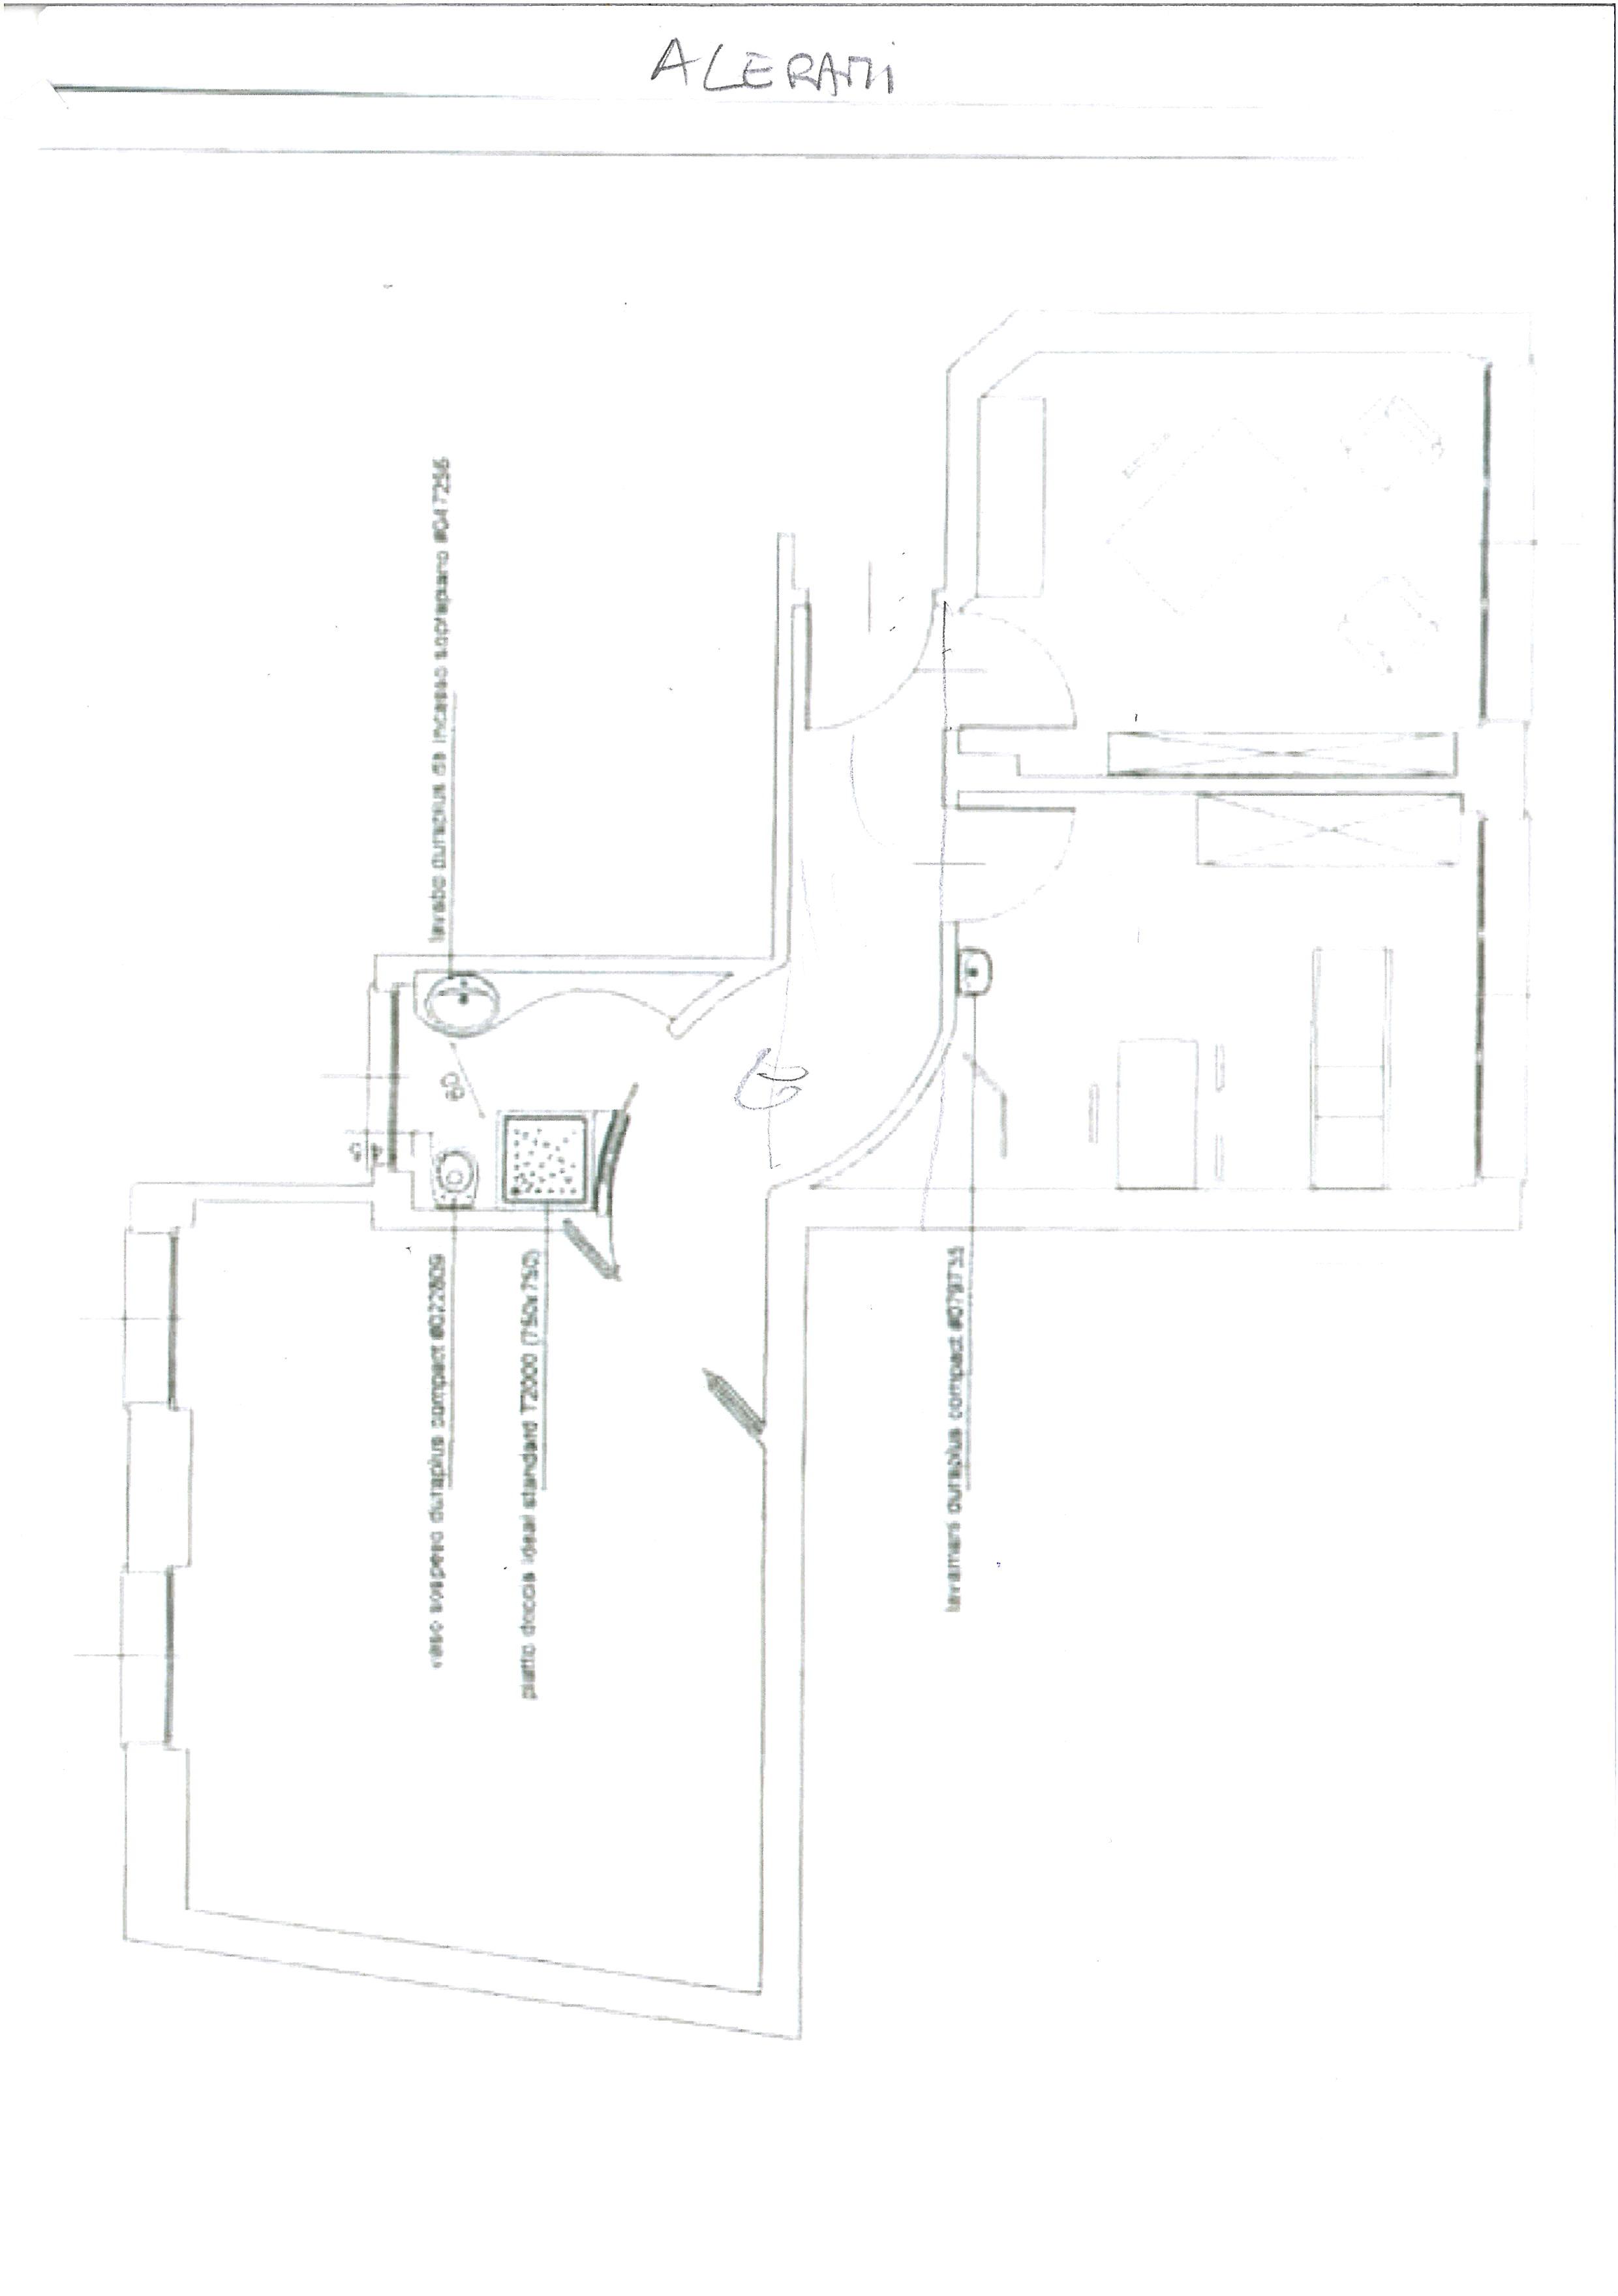 planimetrie/Txp9C6CLJB.jpg